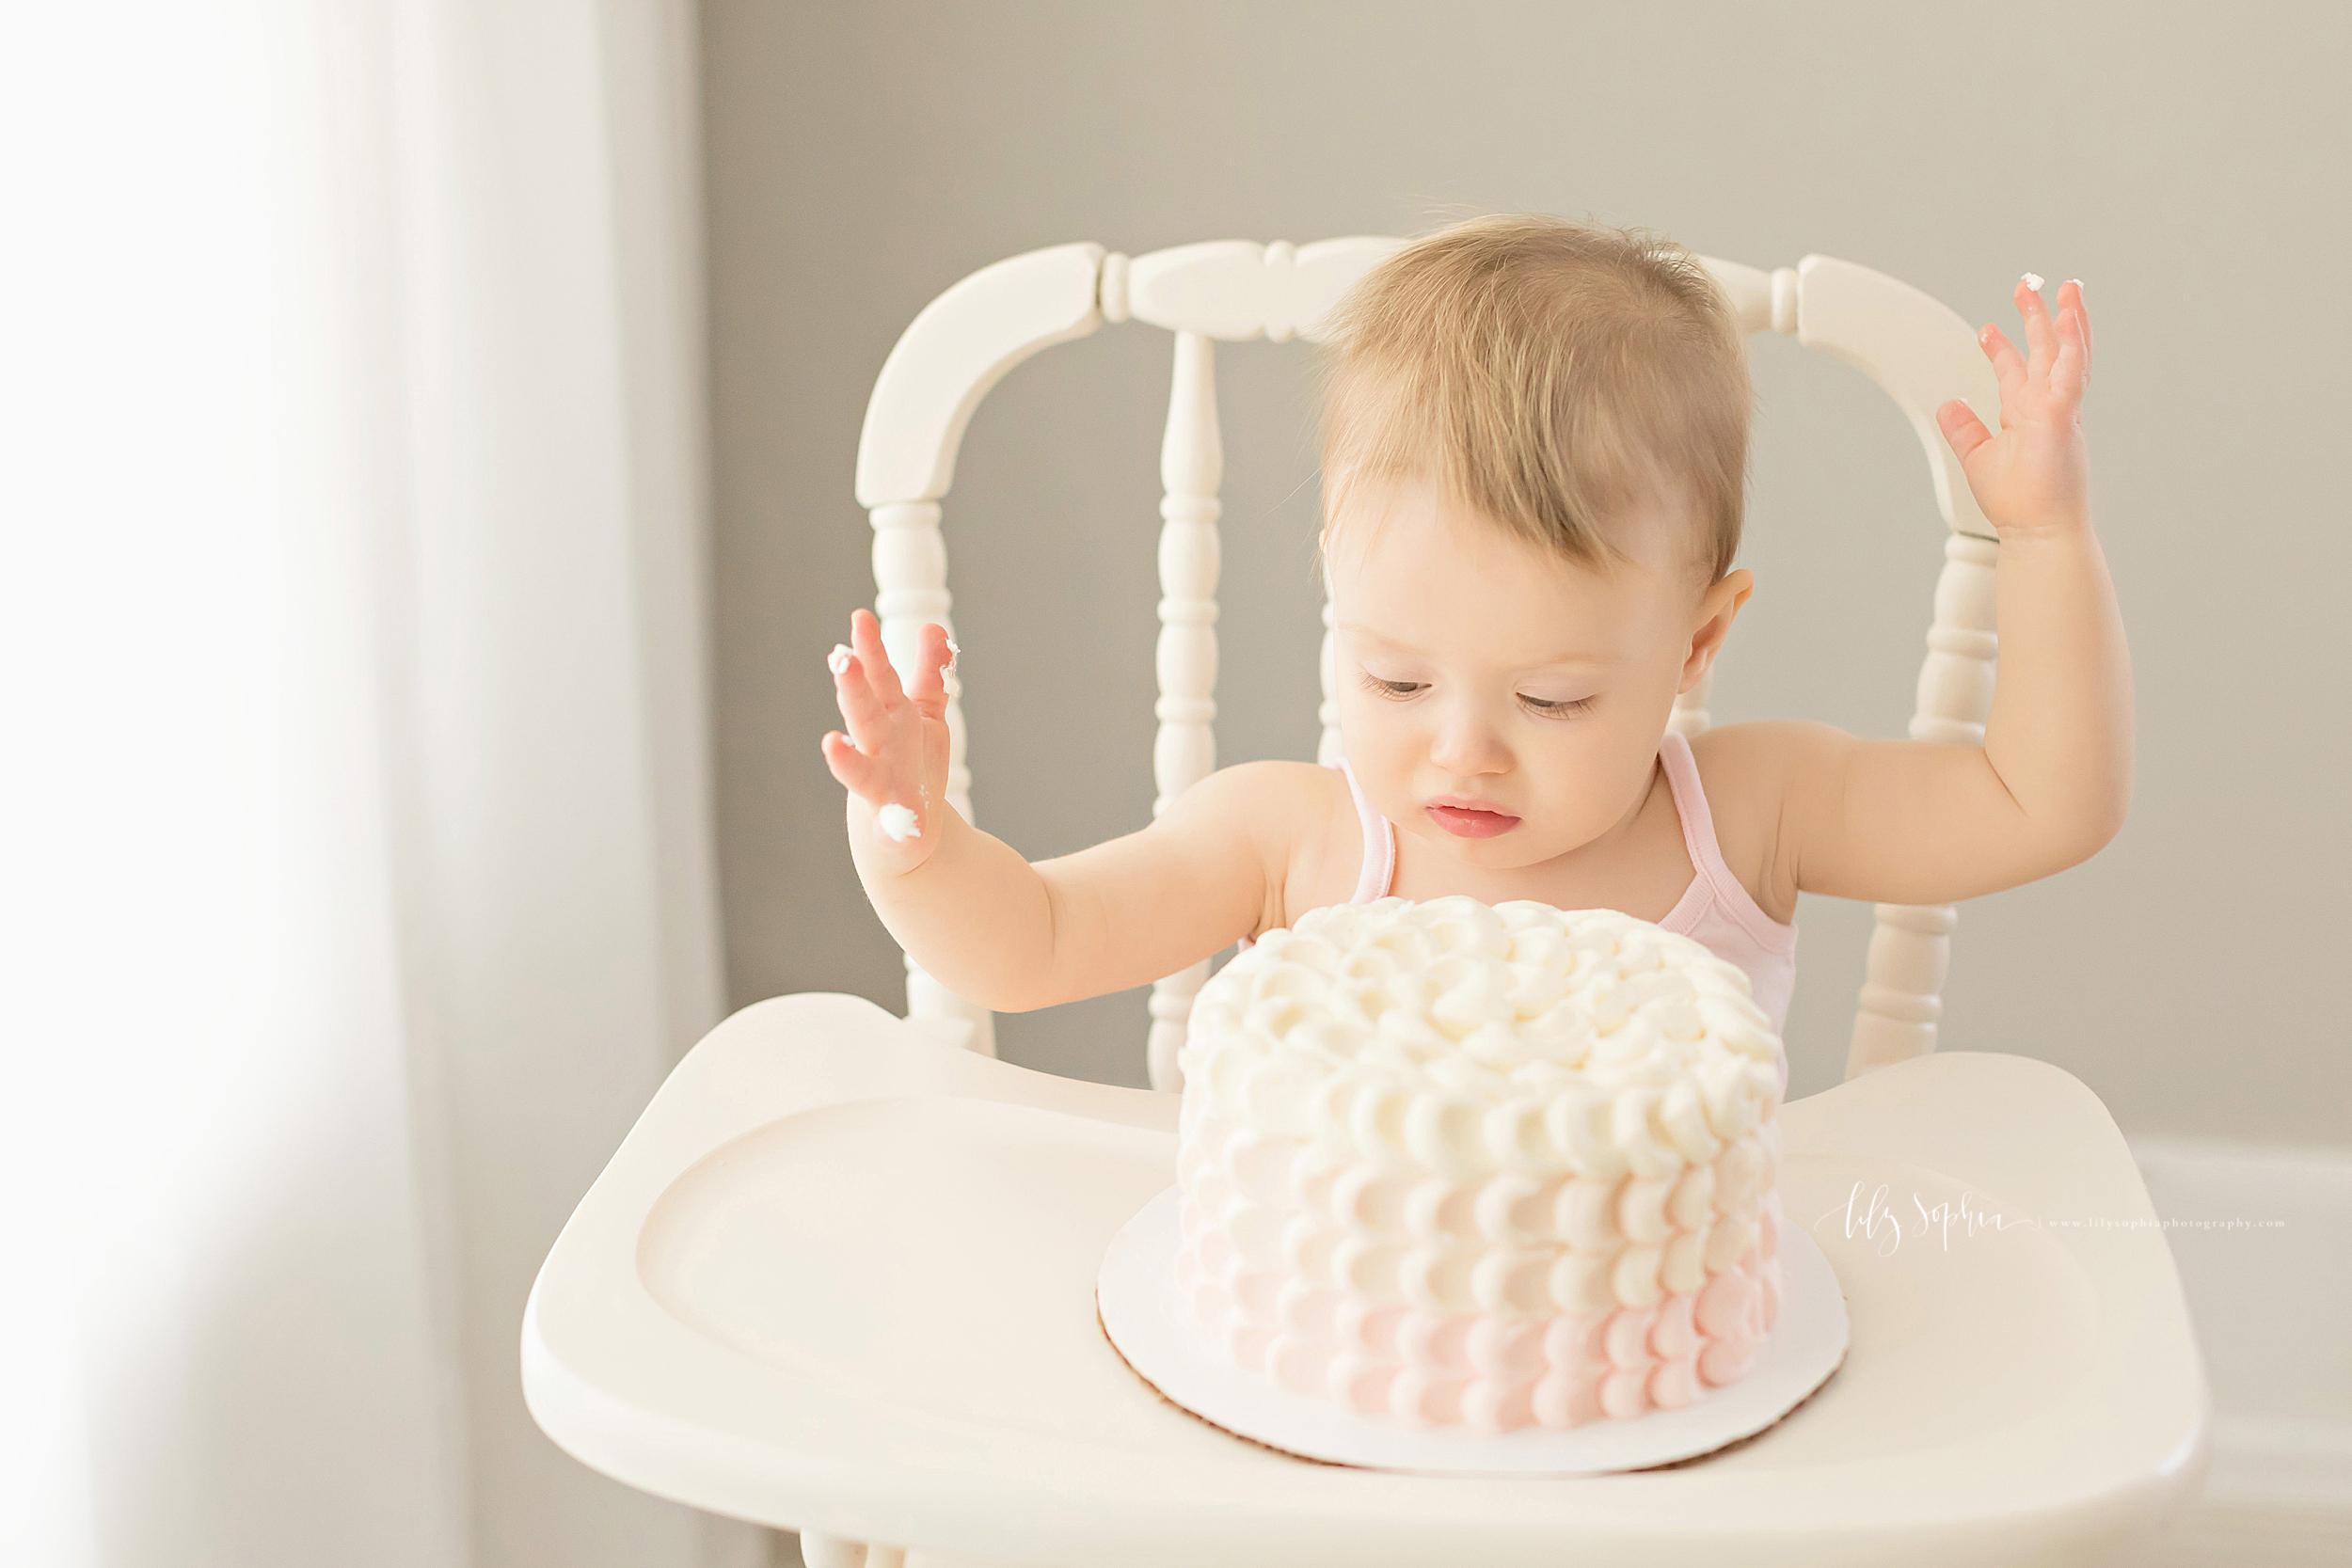 atlanta-midtown-sandy-springs-decatur-lily-sophia-photography-photographer-first-birthday-cake-smash-baby-girl_0209.jpg